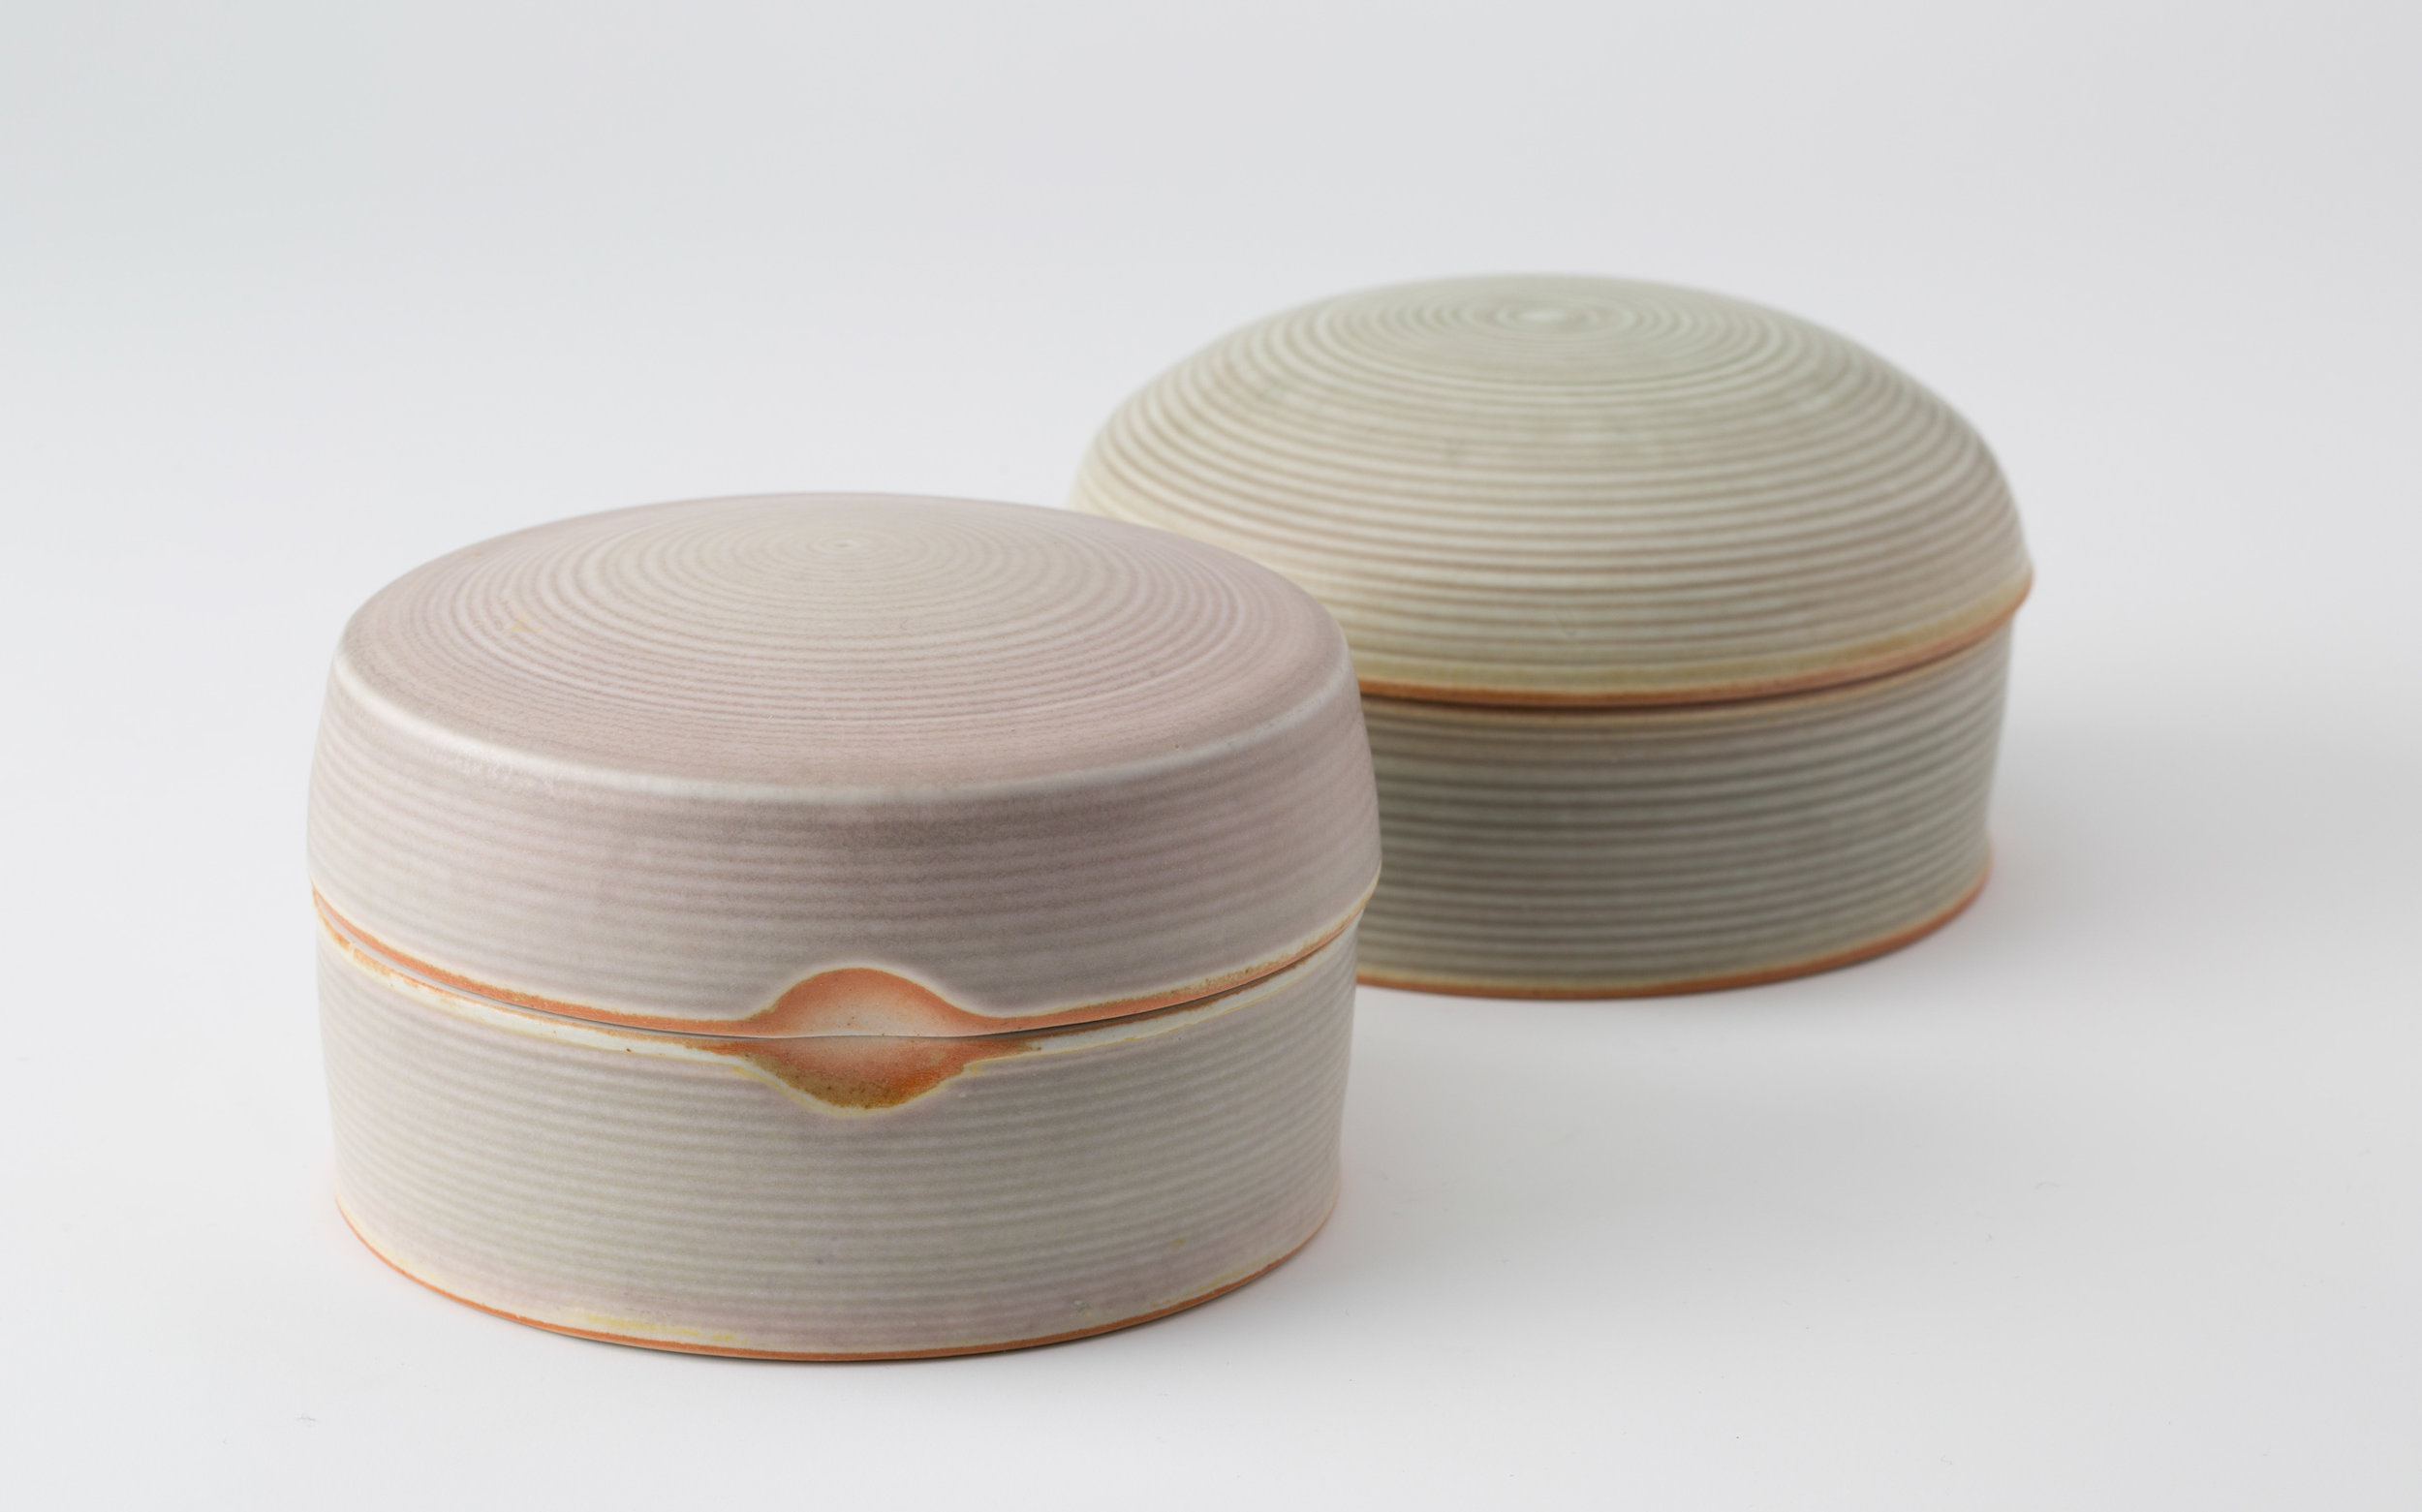 "Boxes  Cone 10 Reduction Porcelain  Pink/Purple Box 3.75"" W x 3"" H  2016"